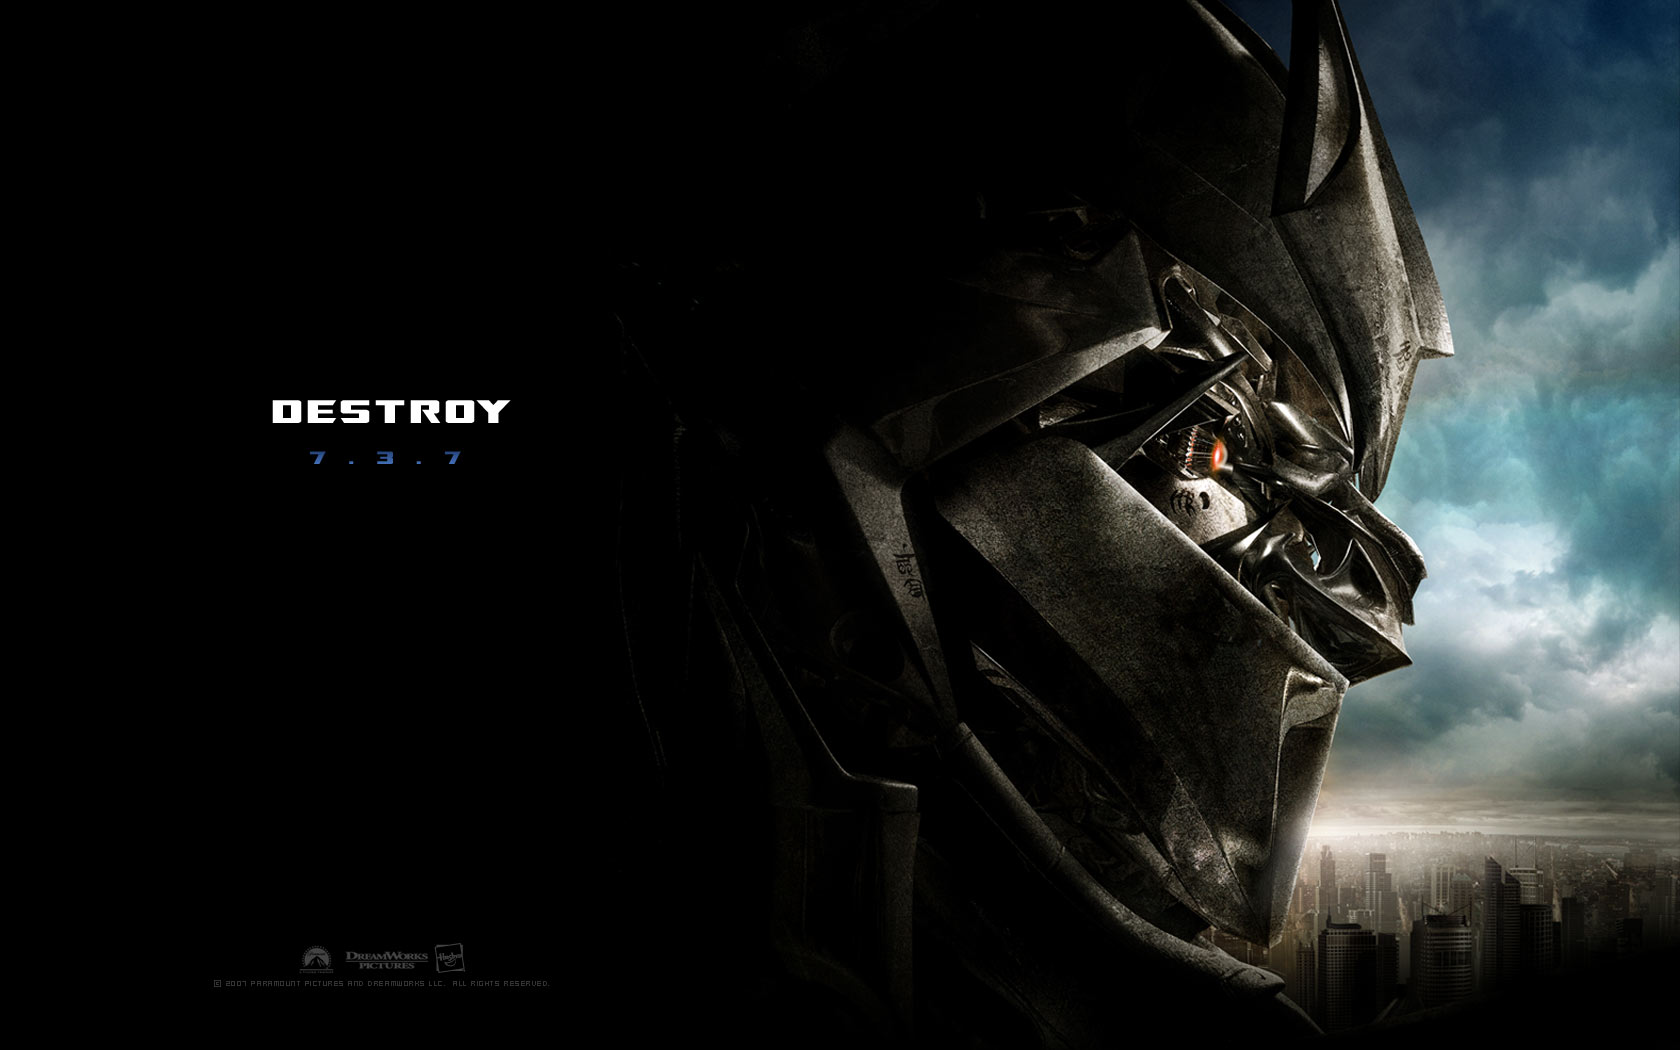 transformers wallpaper widescreen - photo #30